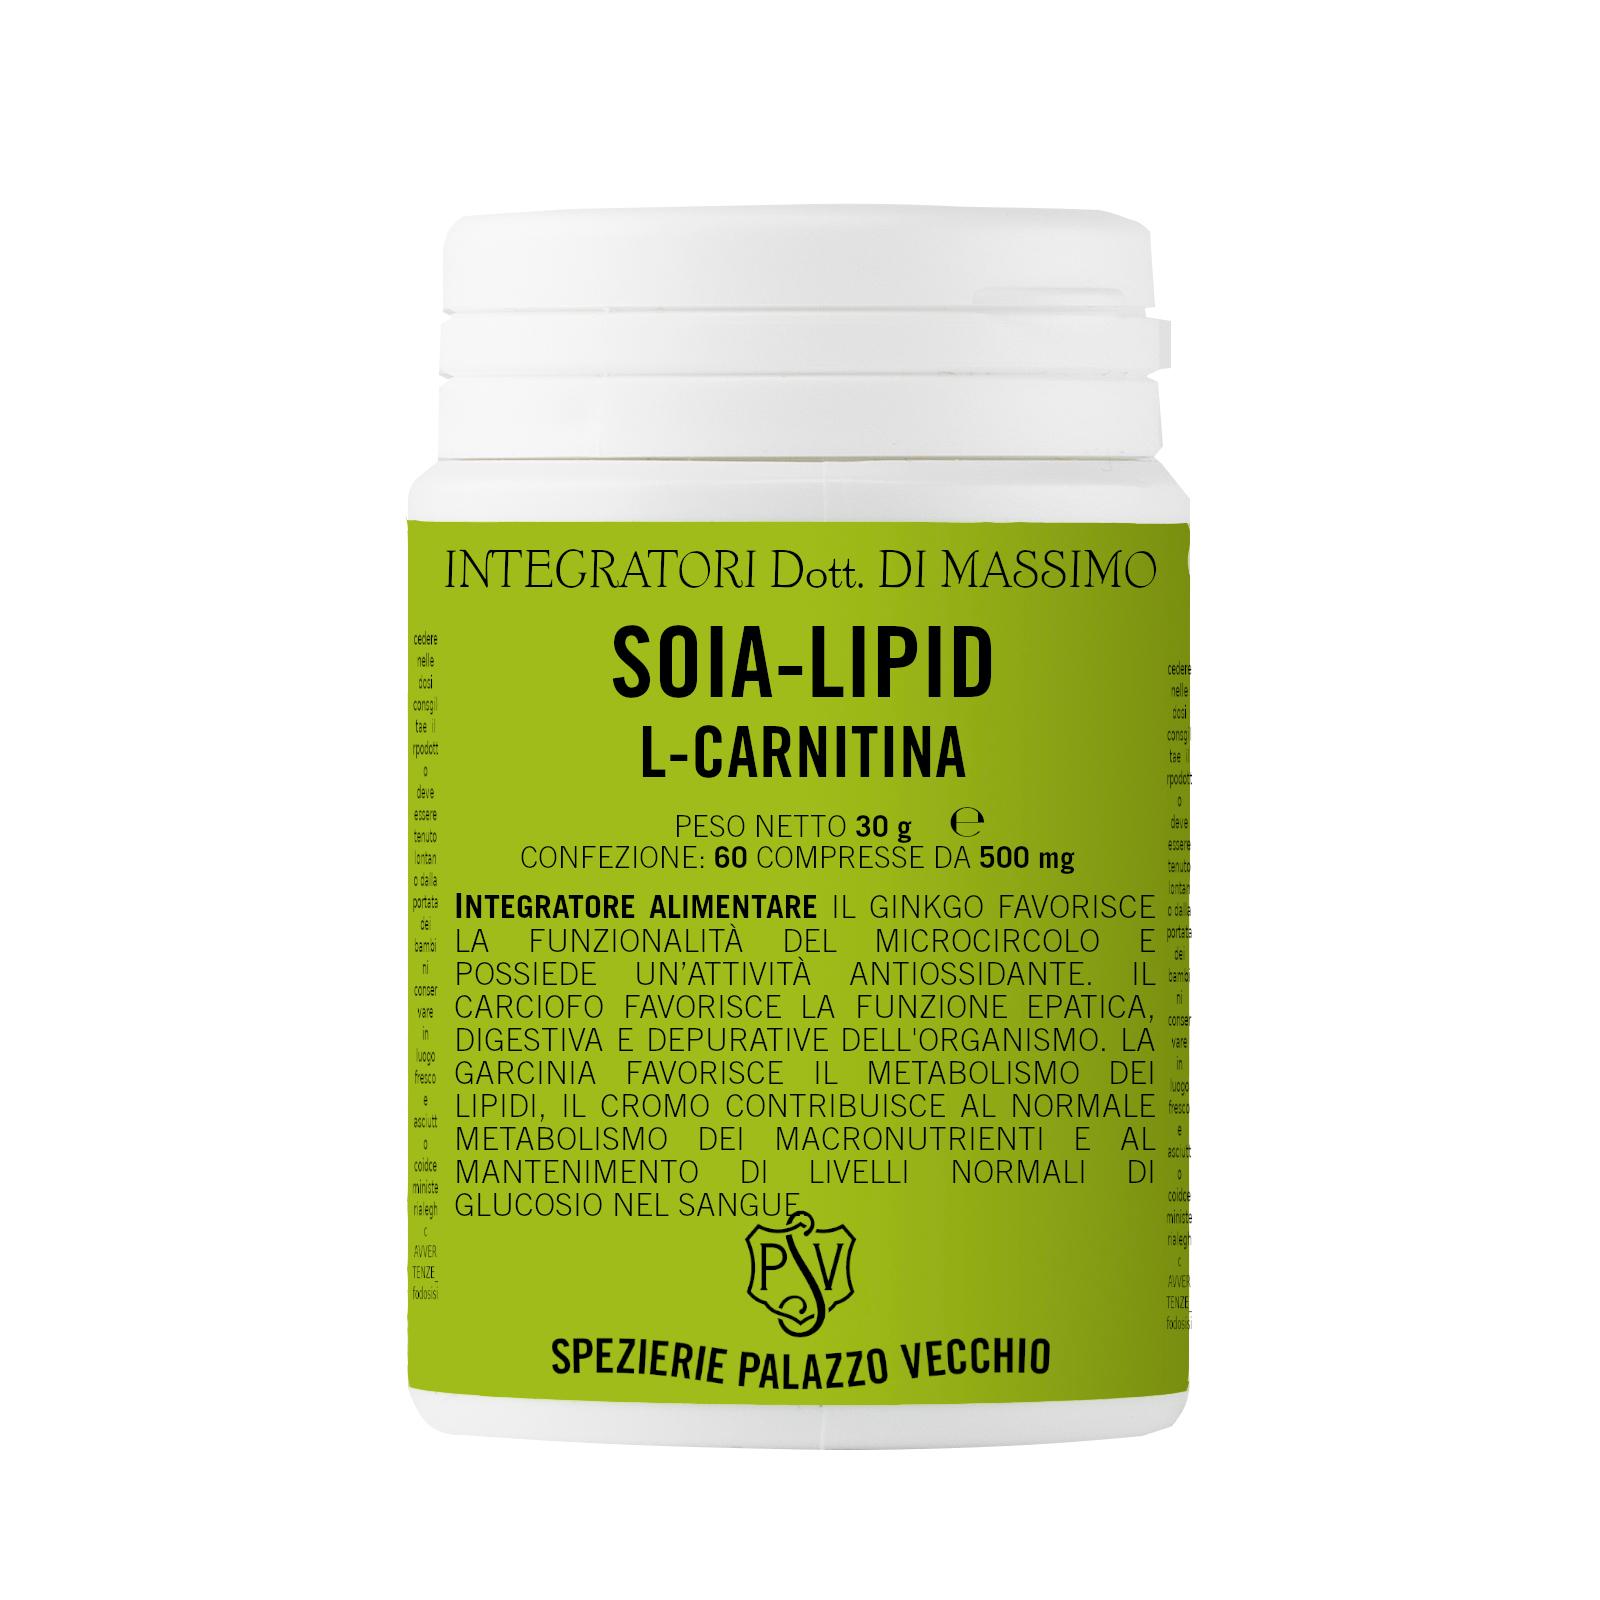 SOIA LIPID CARNITINA-0